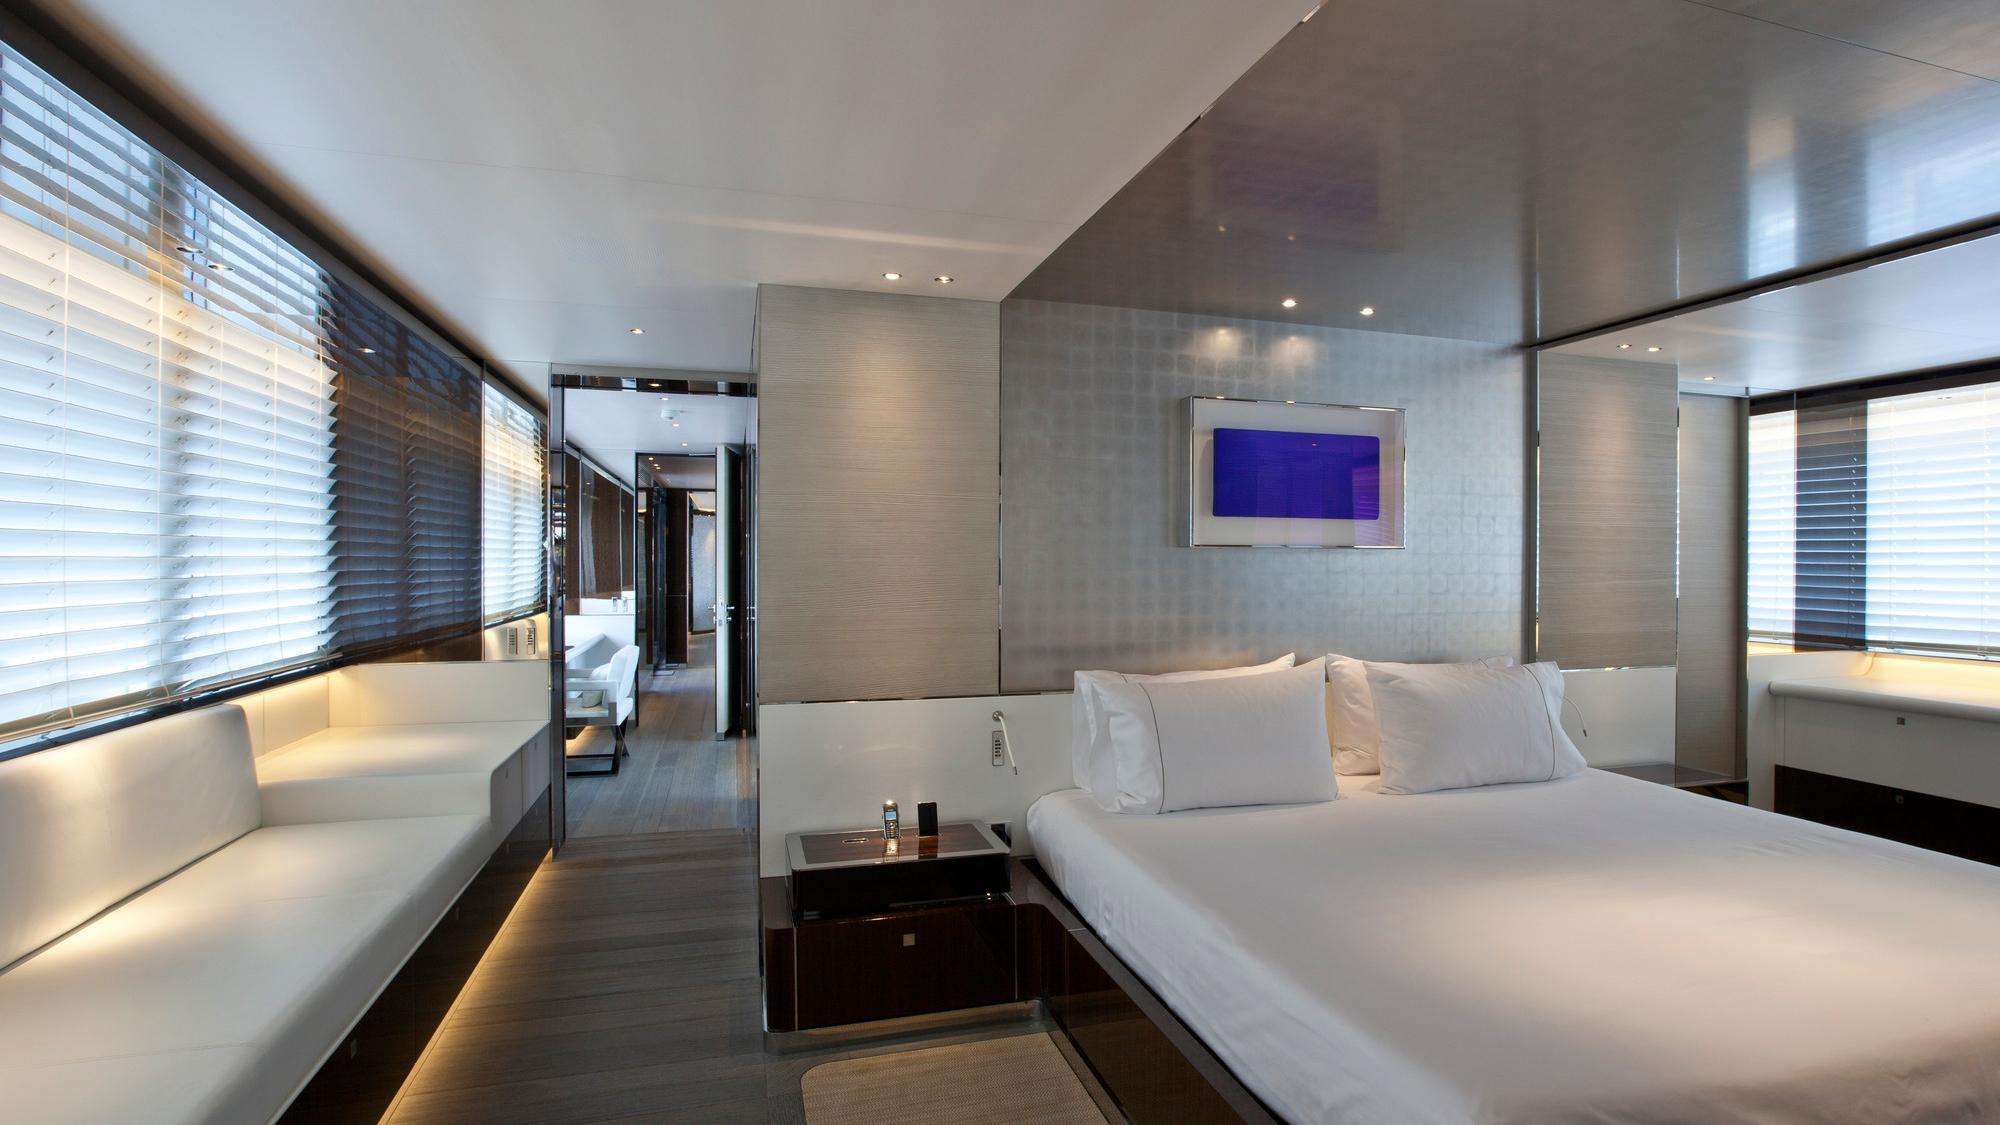 septimus-motor-yacht-heesen-2011-50m-stateroom